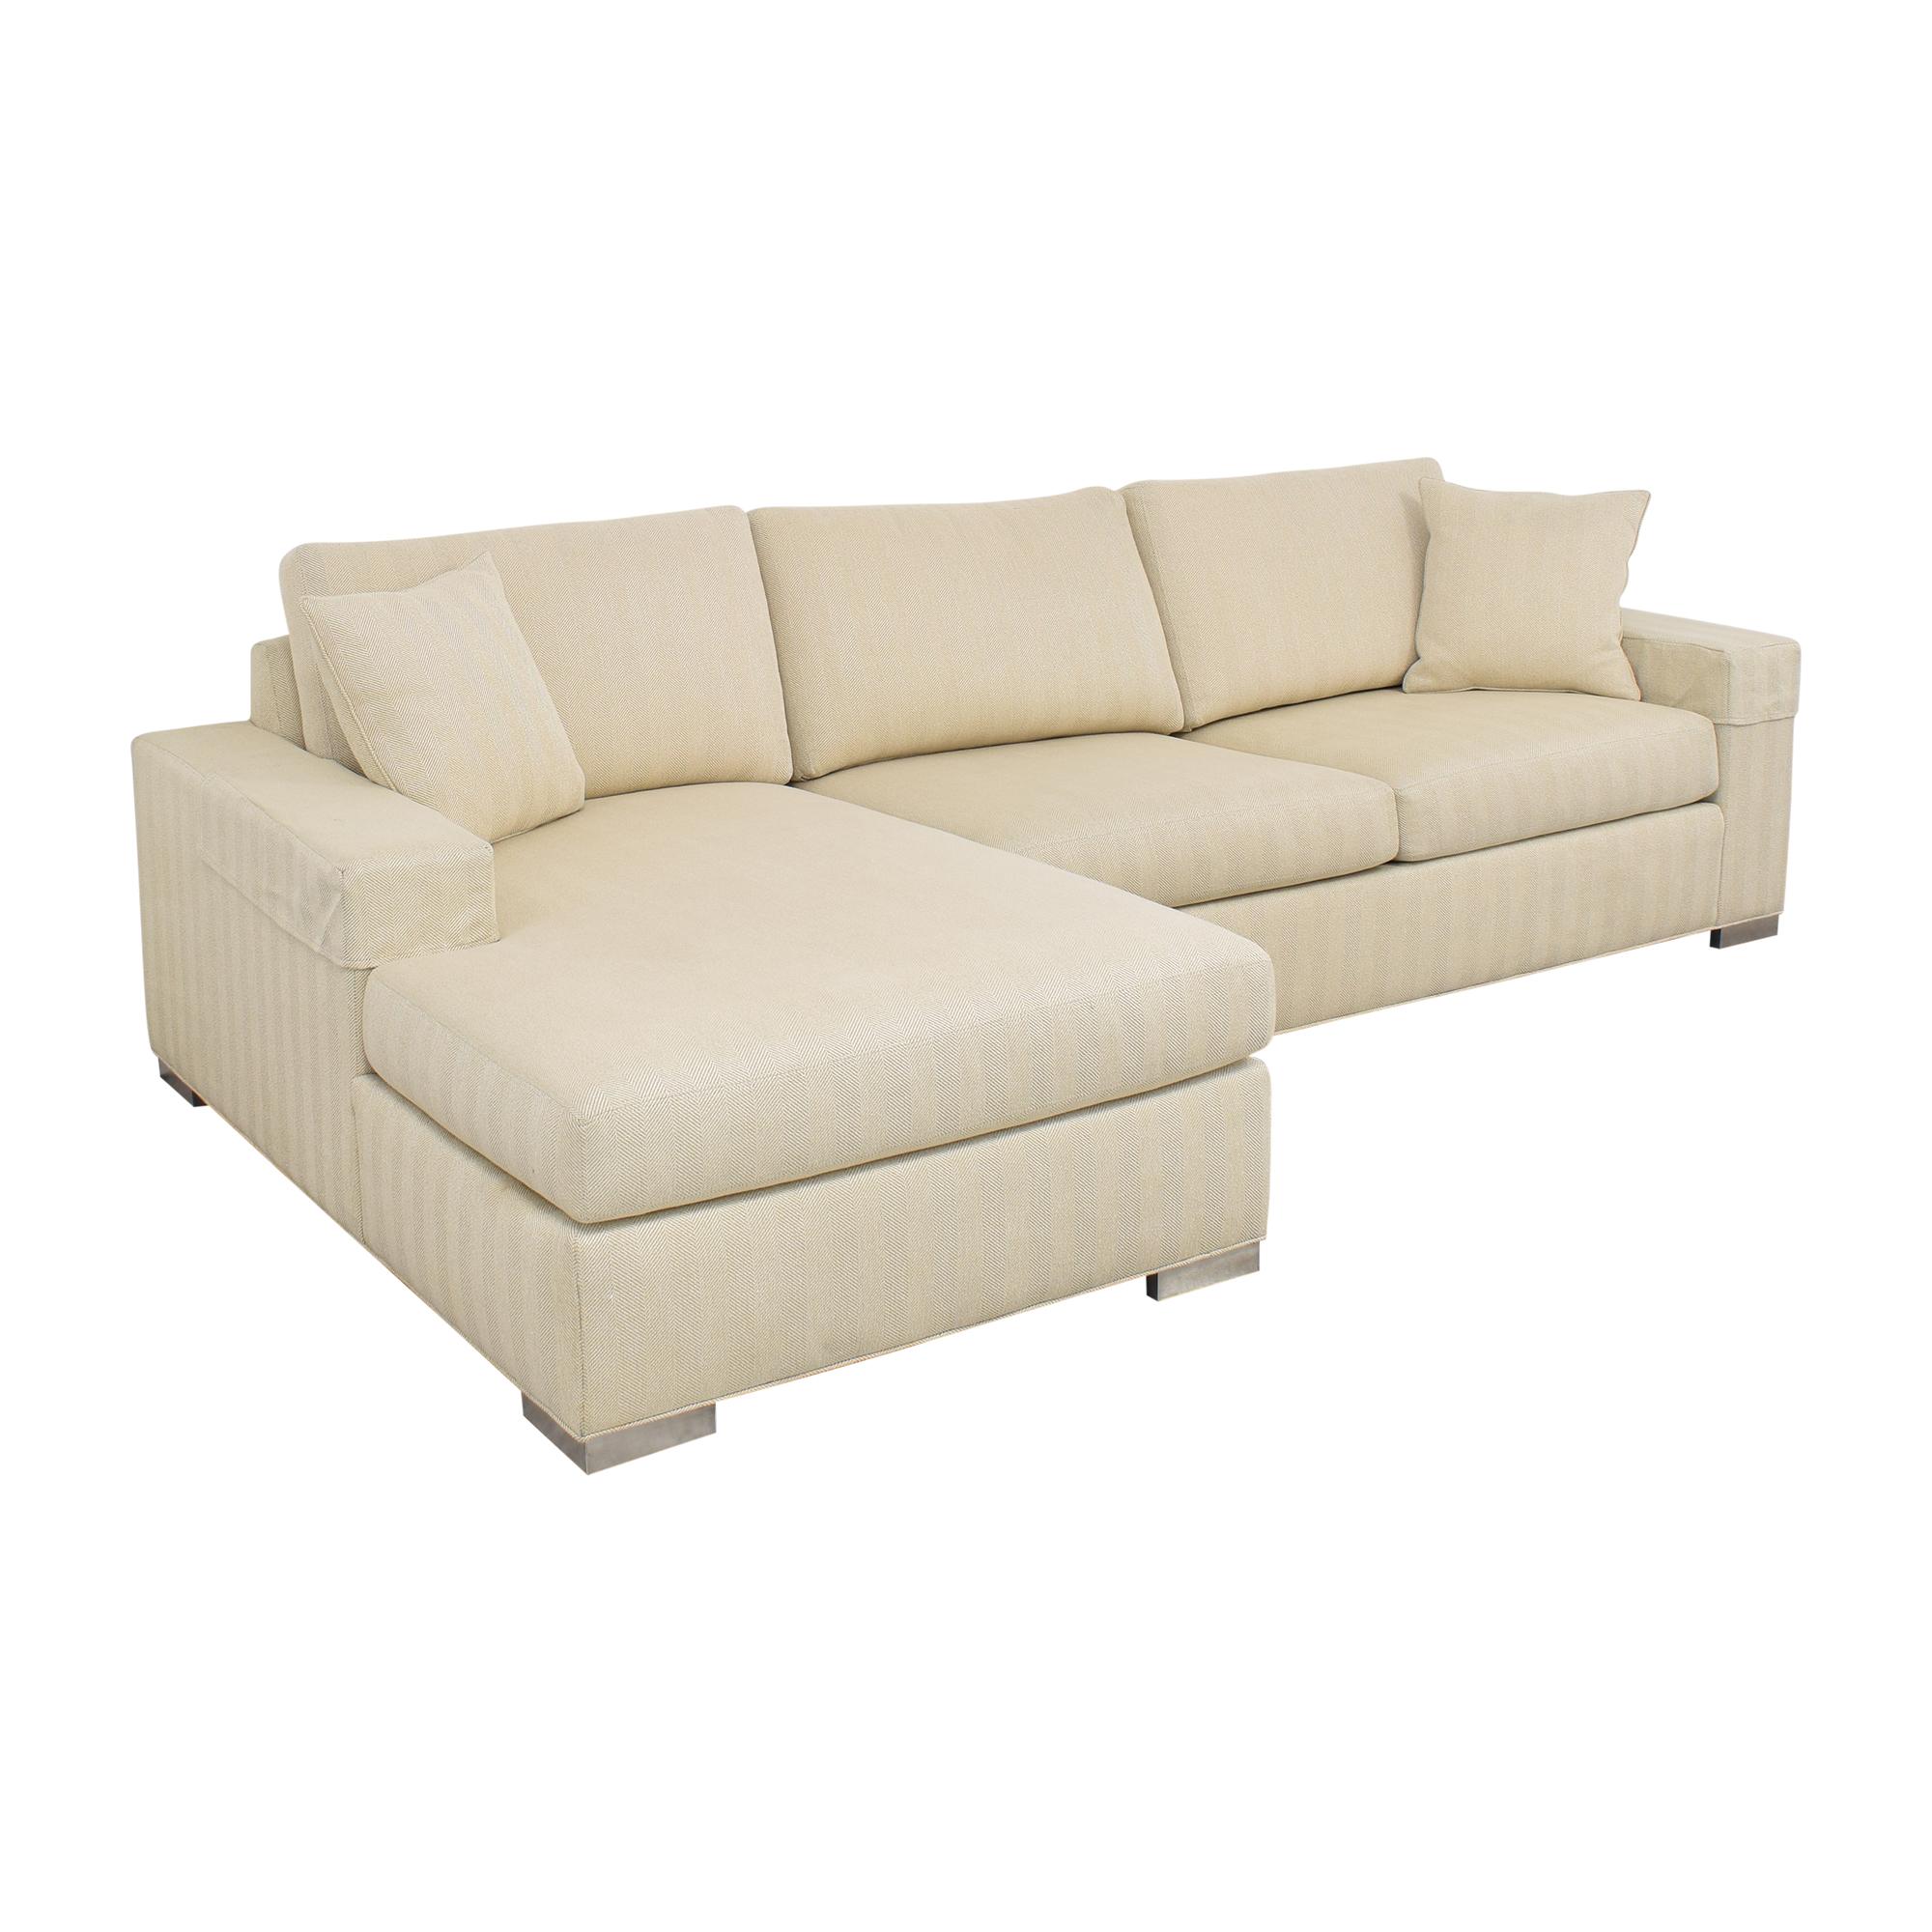 shop Ethan Allen Ethan Allen Conway Sectional Sofa online